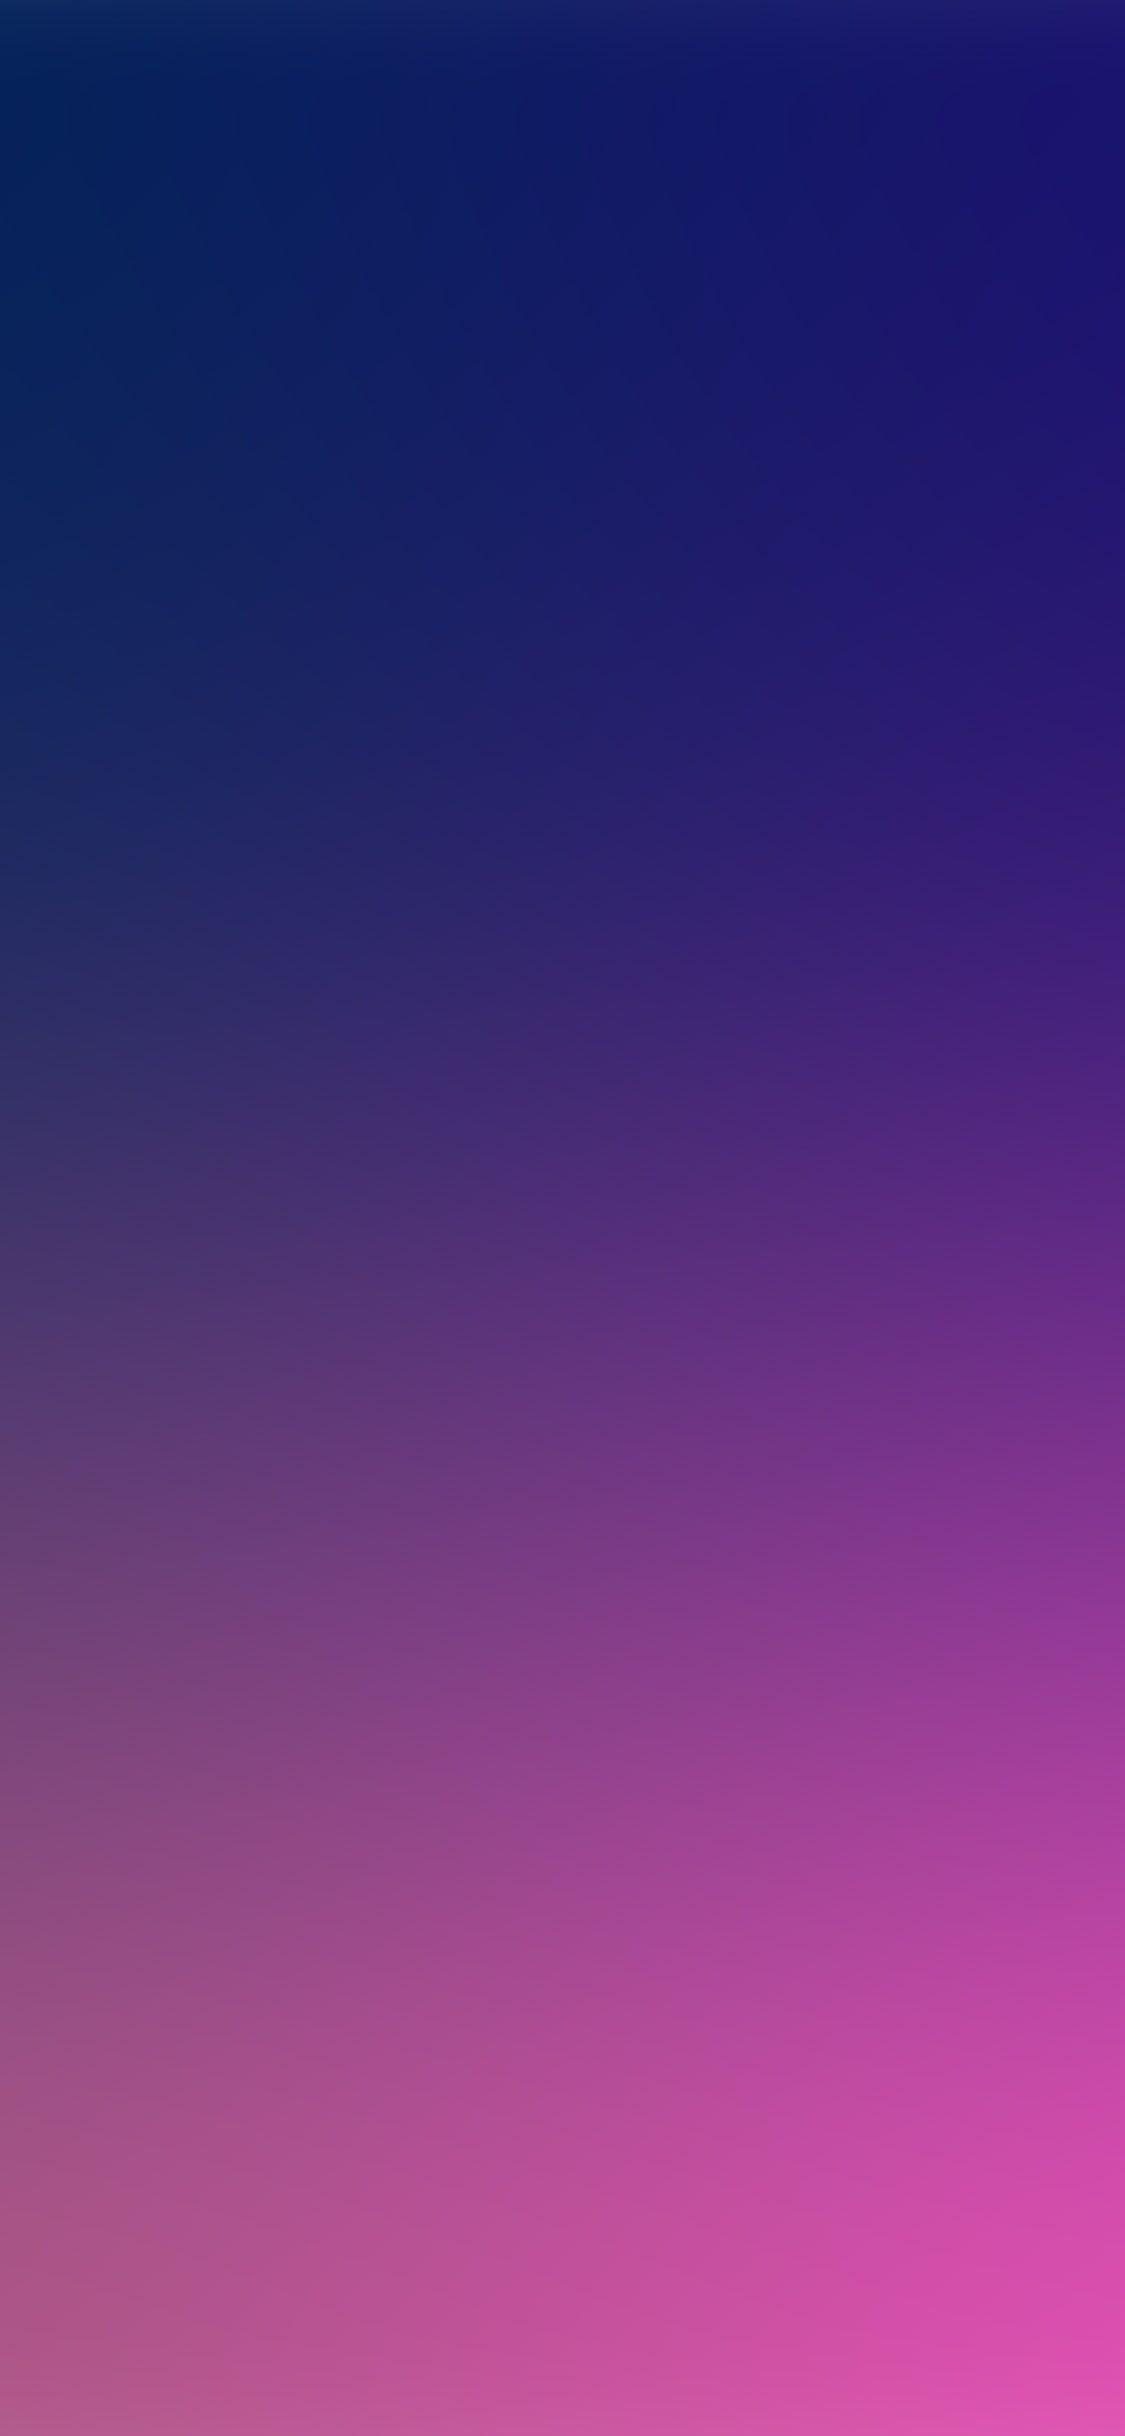 Sm27 Blue Purple Color Blur Gradation Via Http Iphonexpapers Com Wallpapers For Iphone X Purple Colour Wallpaper Color Blur Purple Wallpaper